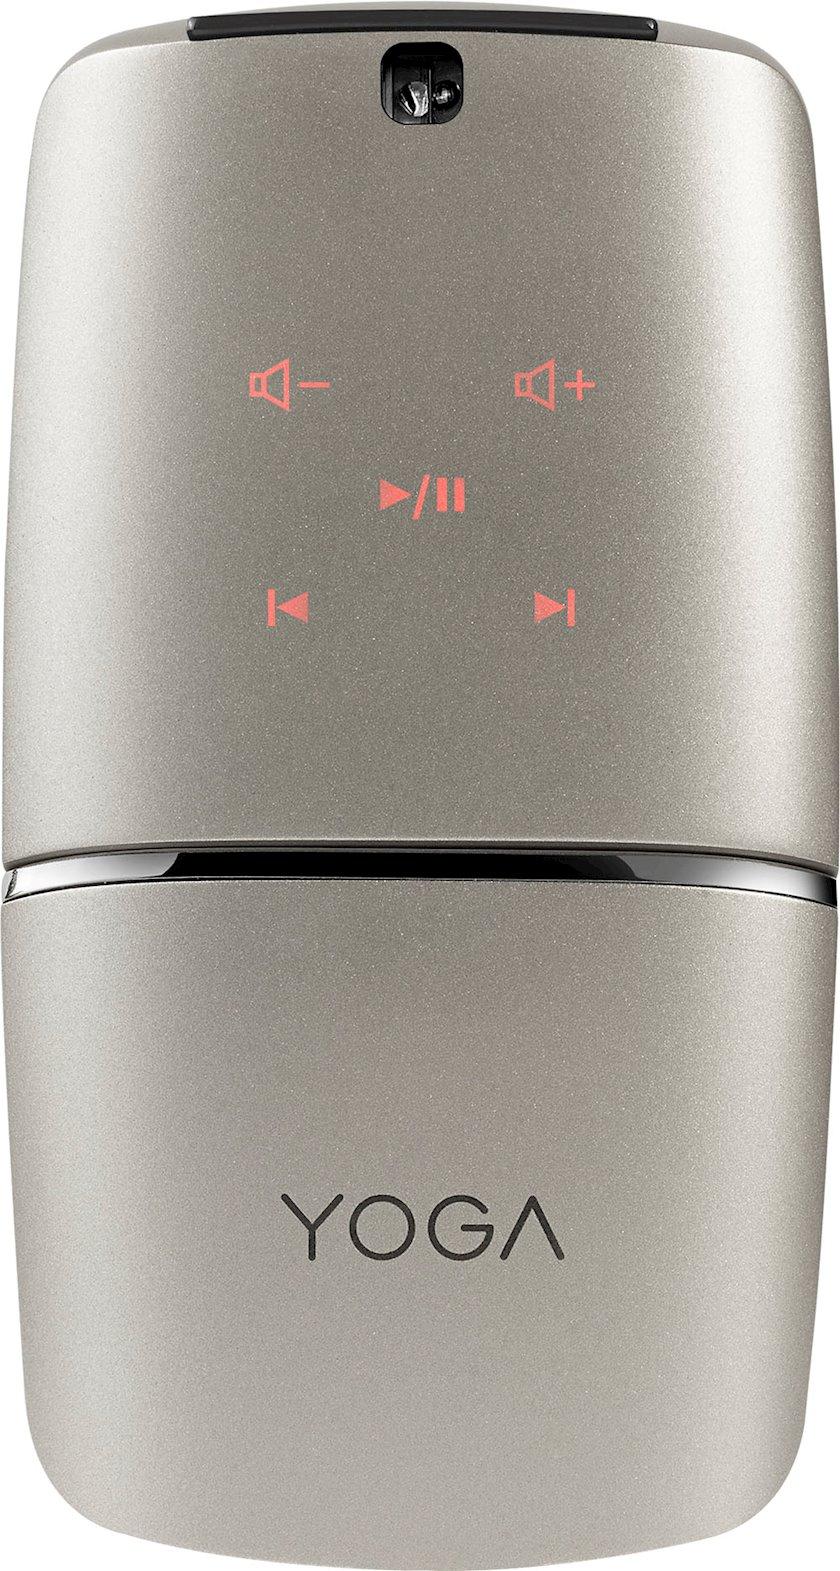 Sıçan Lenovo Yoga Mouse Premium Class Silver